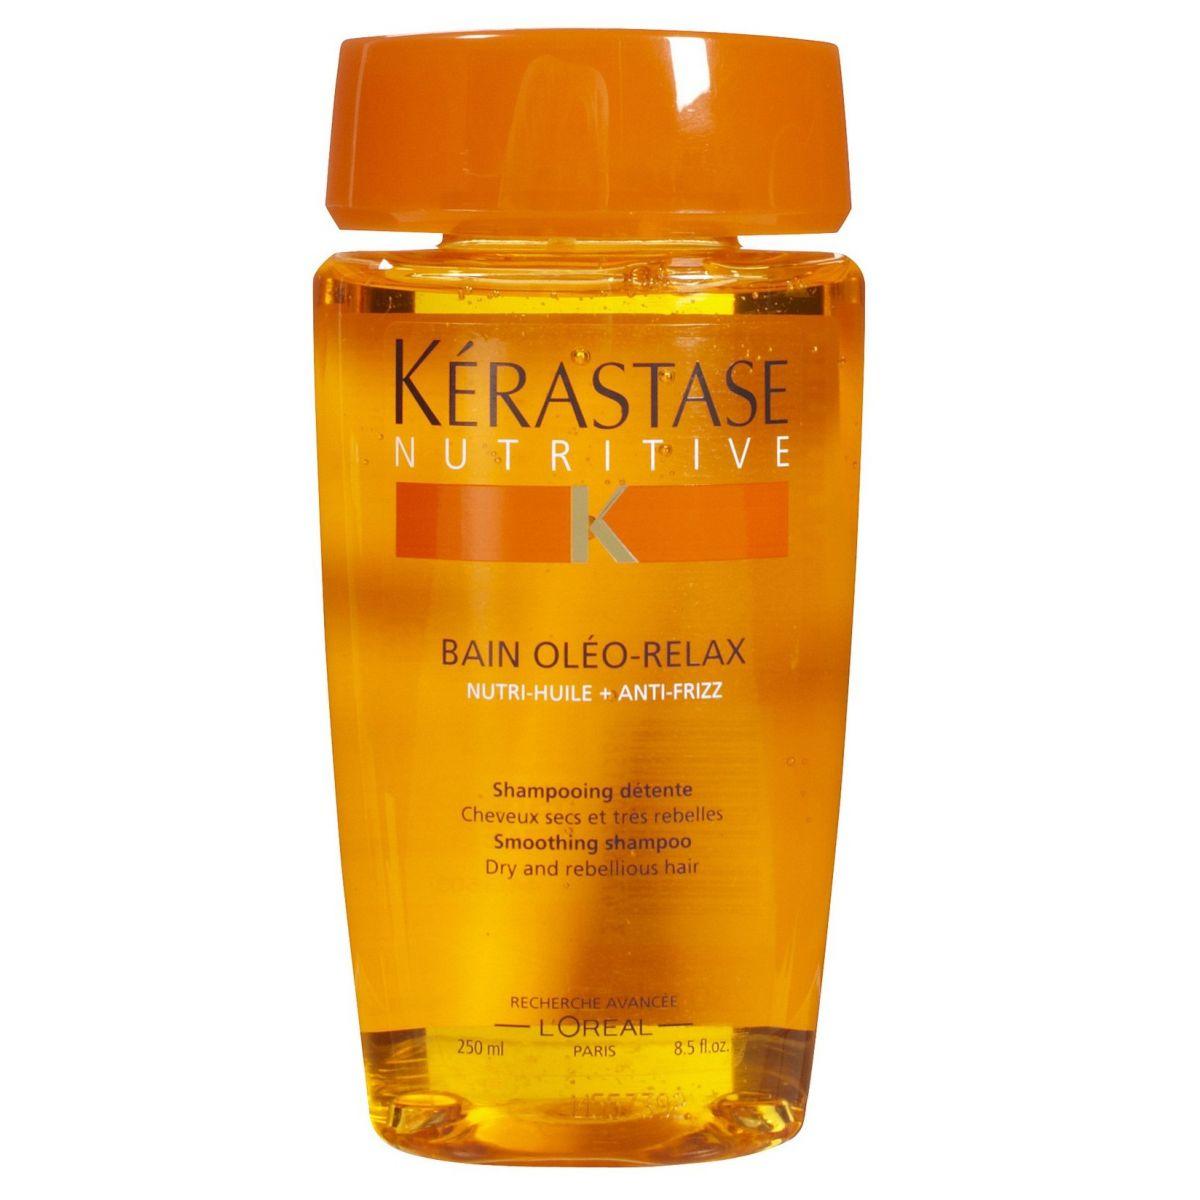 kerastase-nutritive-bain-oleo-relax-shampoo-250ml_1_1200